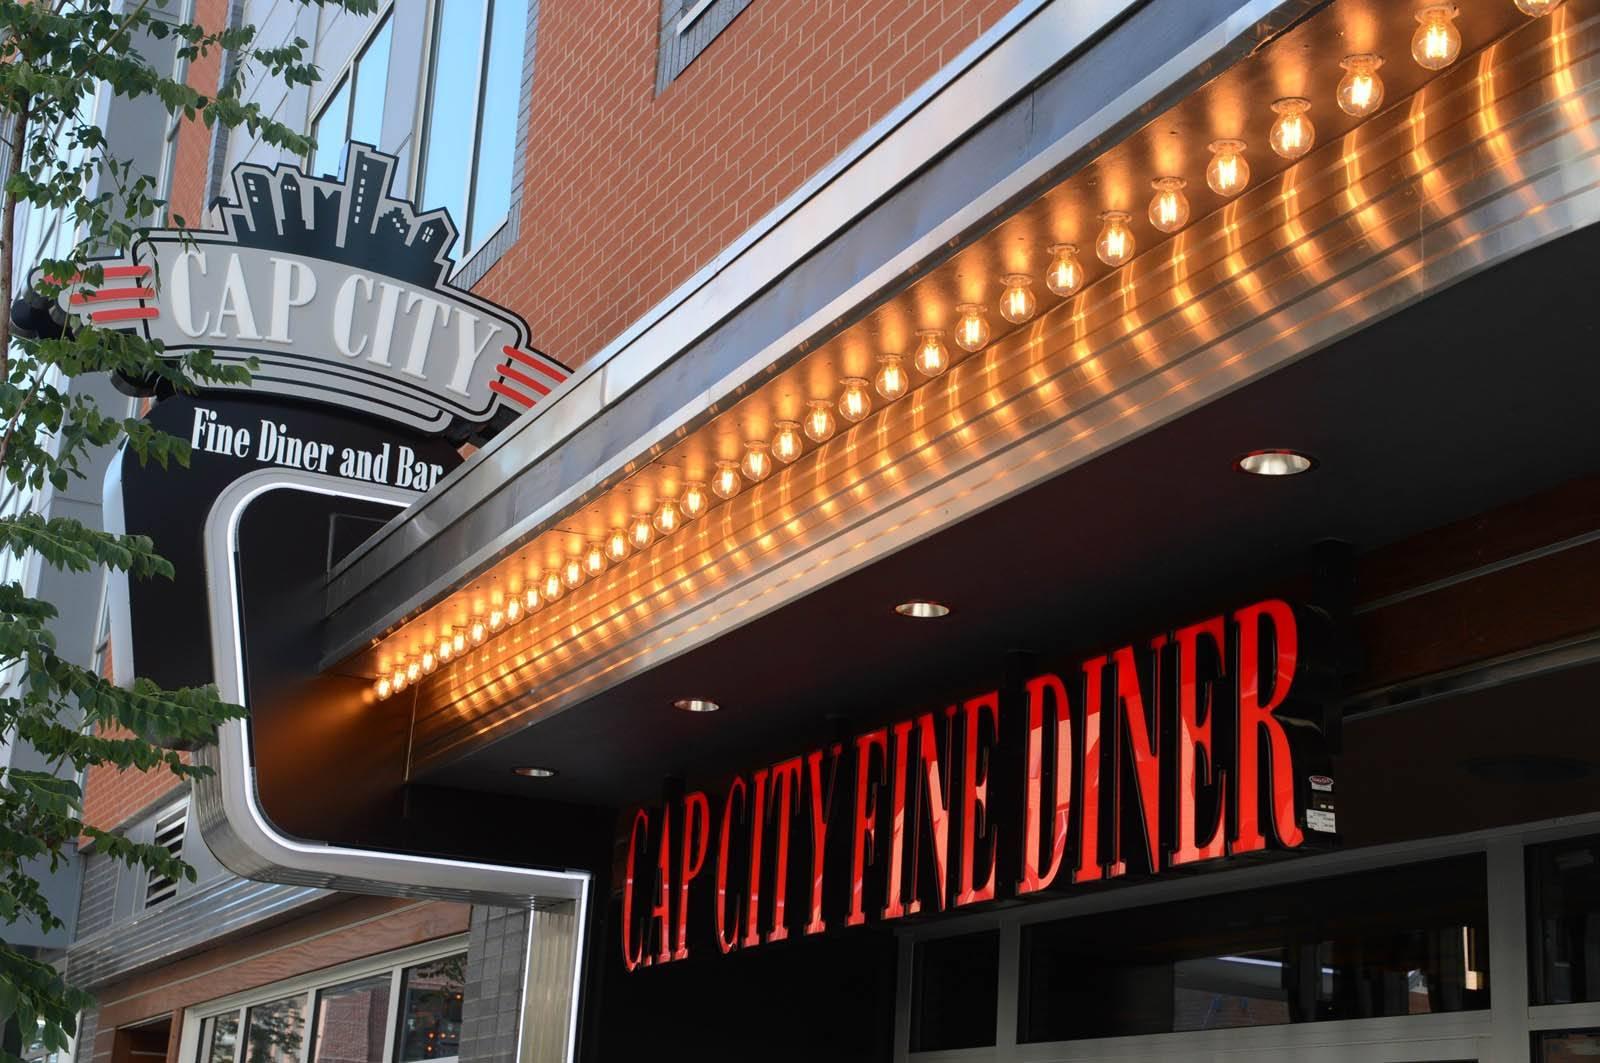 Cap city Diner Exterior